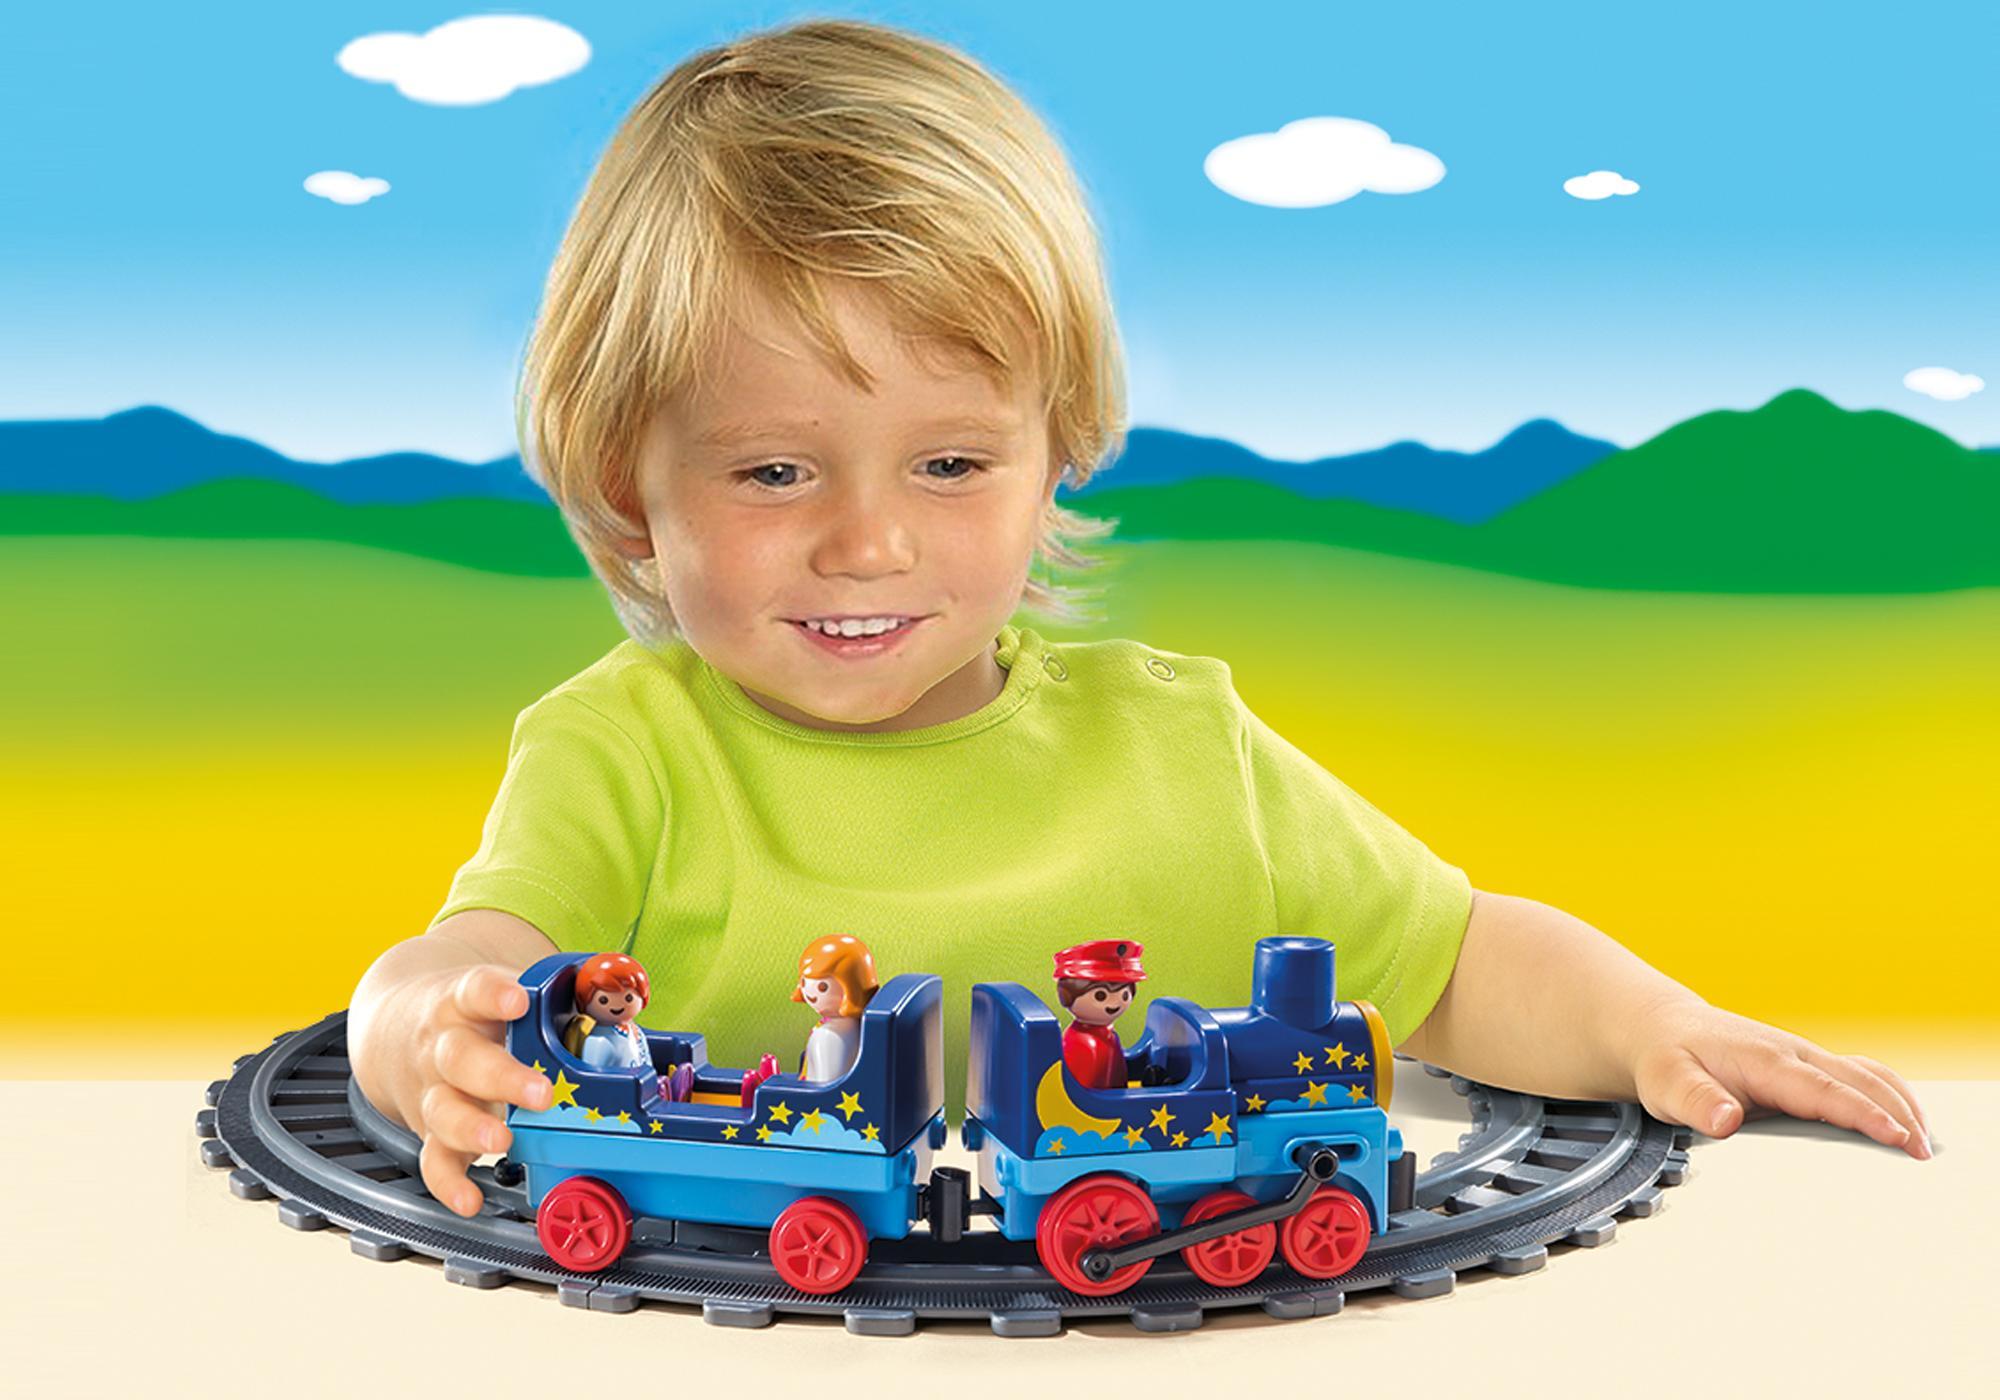 http://media.playmobil.com/i/playmobil/6880_product_extra2/Night Train with Track